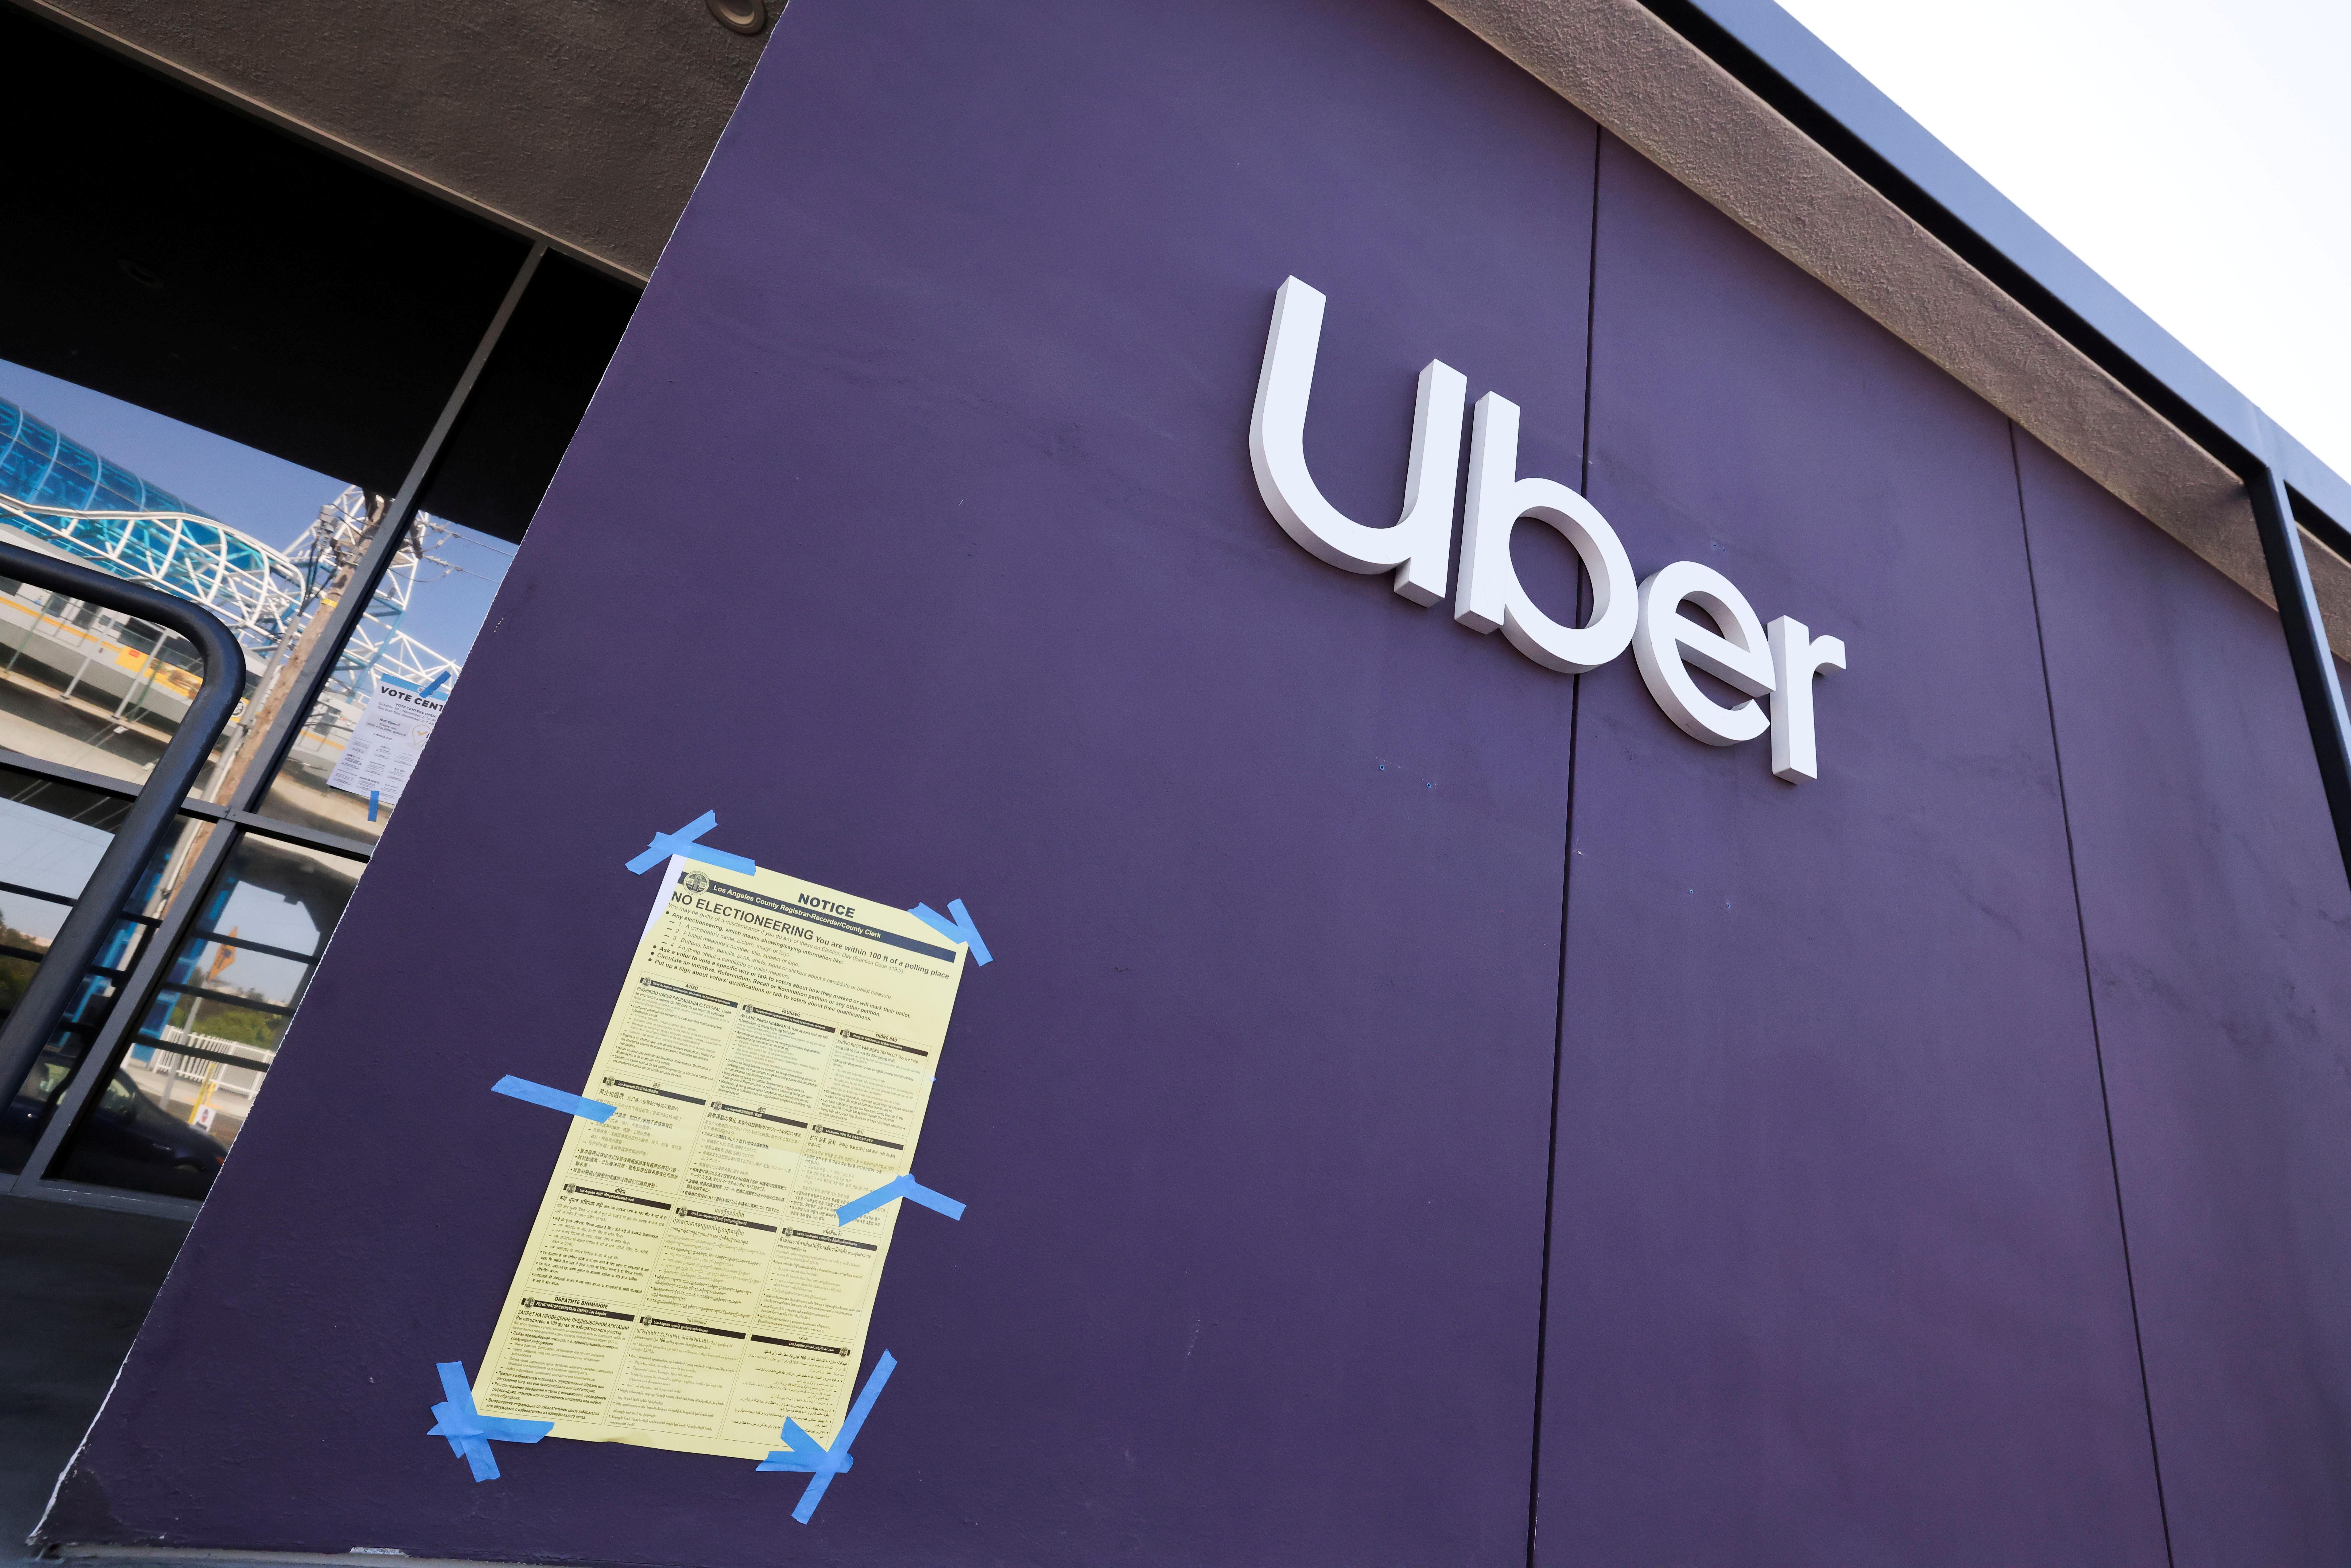 An Uber logo is seen during the global outbreak of the coronavirus disease (COVID-19), in Redondo Beach, Los Angeles, California, U.S., November 2, 2020. REUTERS/Lucy Nicholson/File Photo